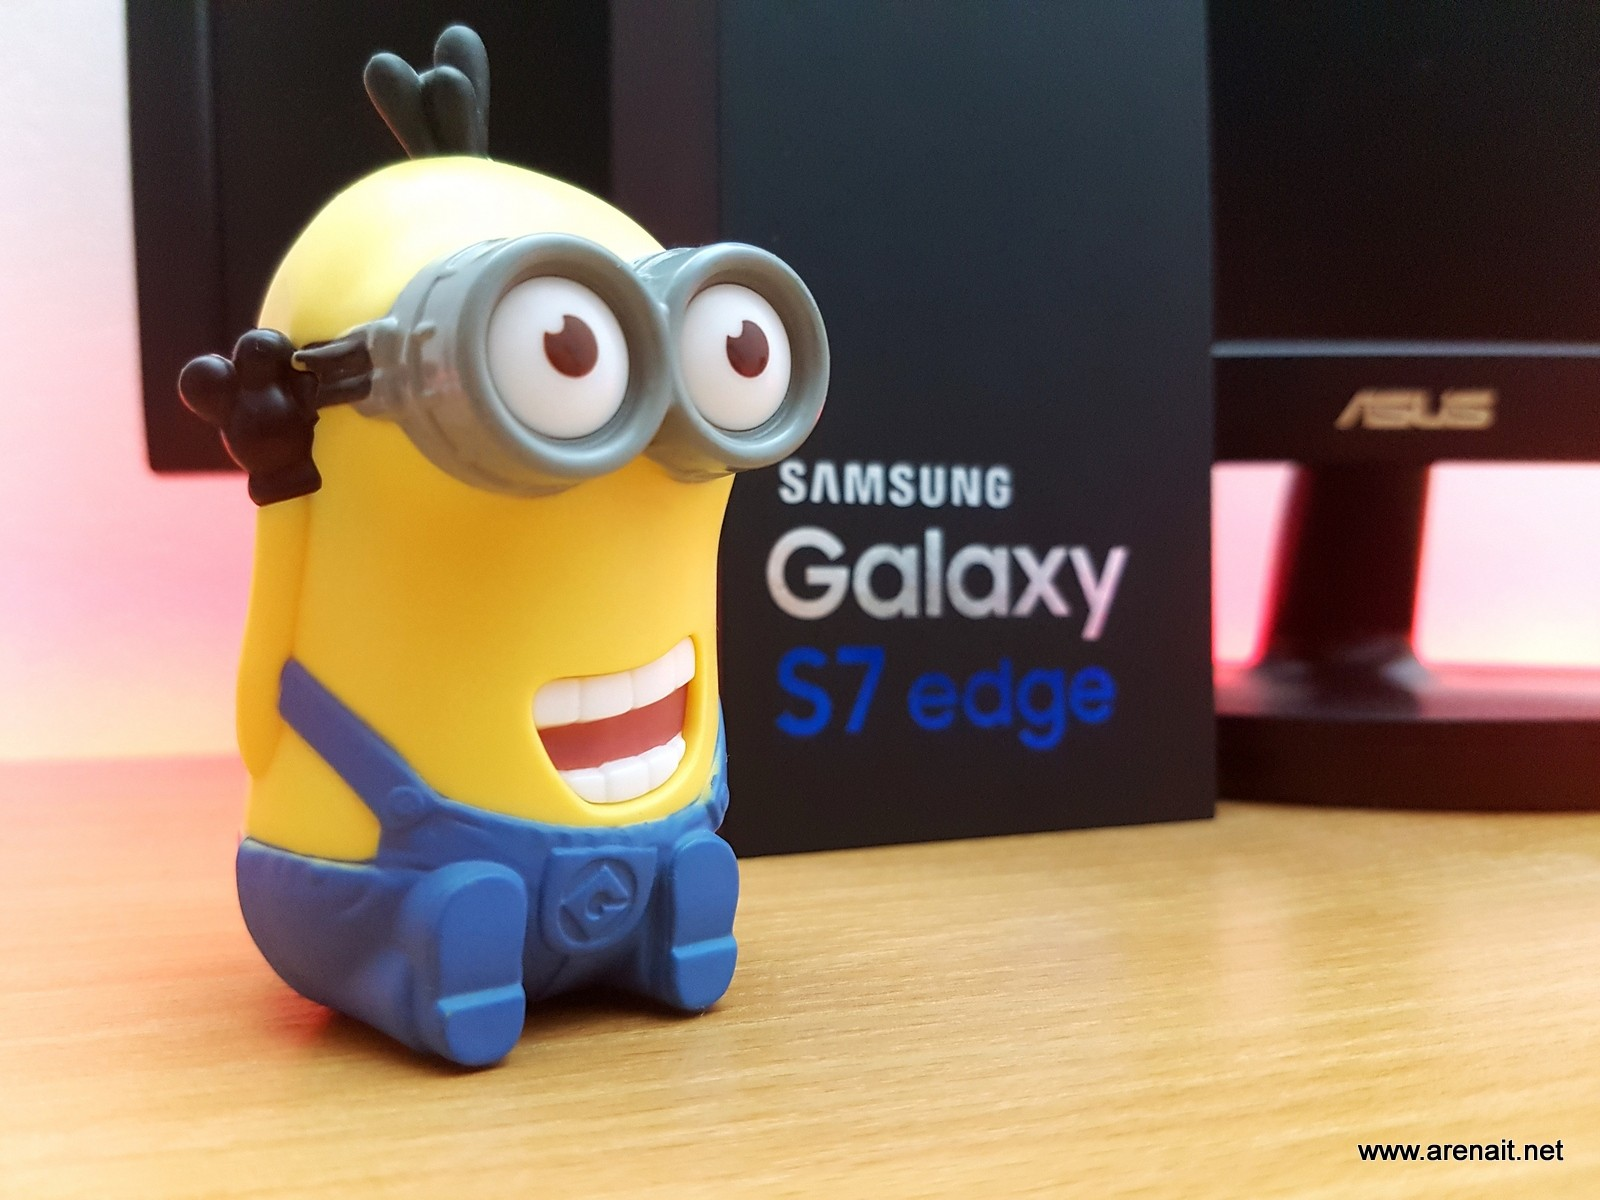 Oferta zilei: Samsung Galaxy S7 Edge la 2198 lei